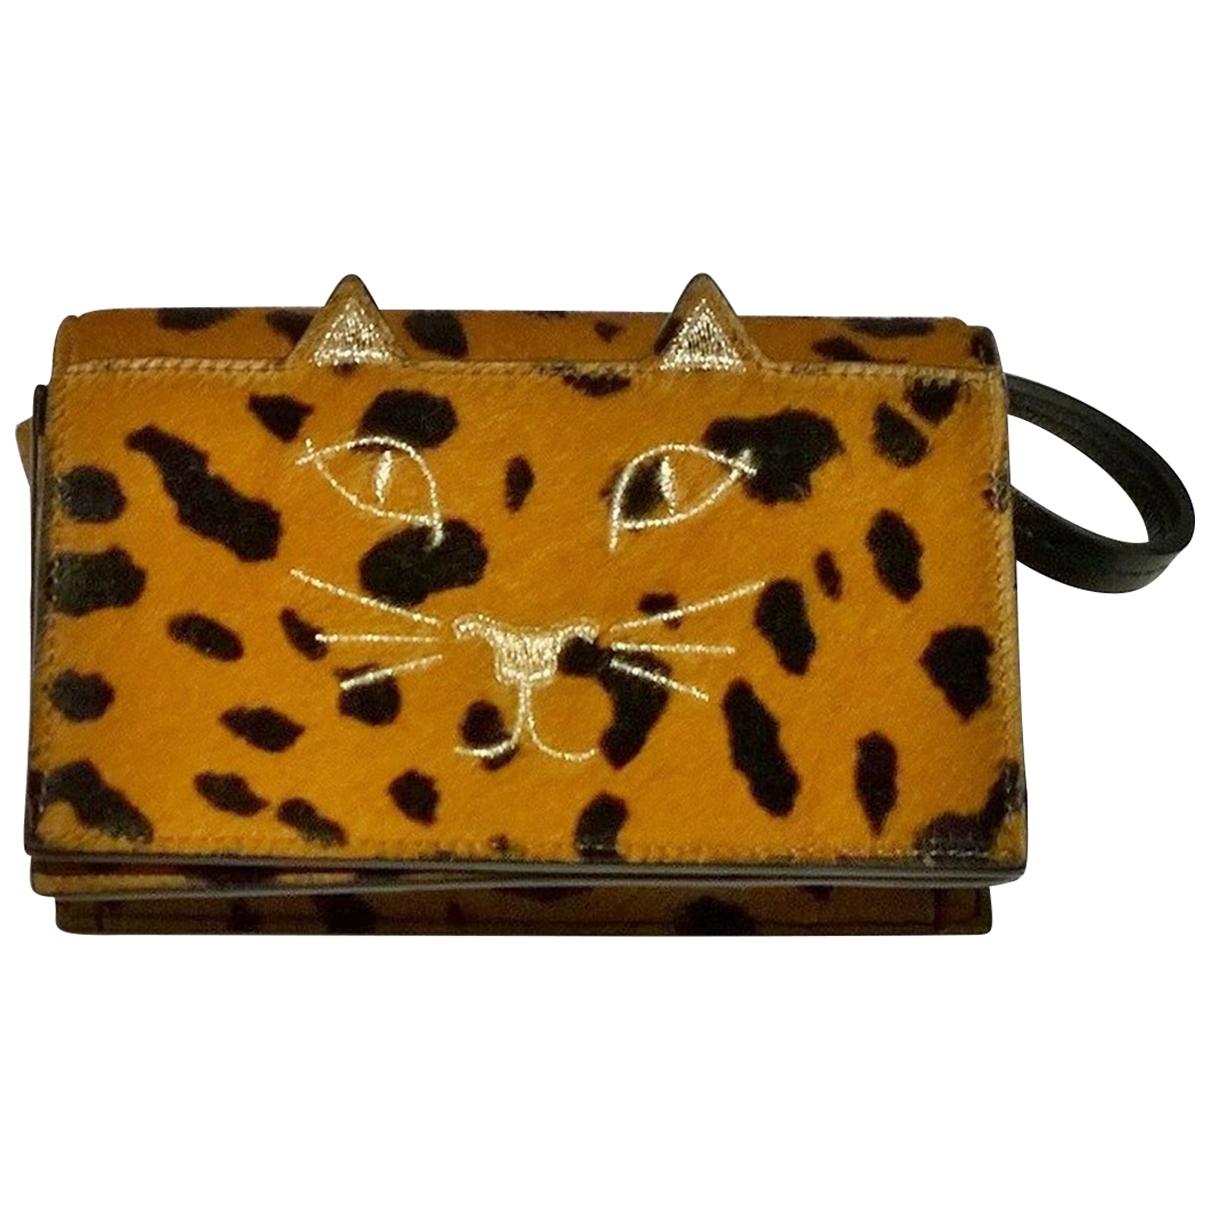 Charlotte Olympia \N Brown Pony-style calfskin handbag for Women \N